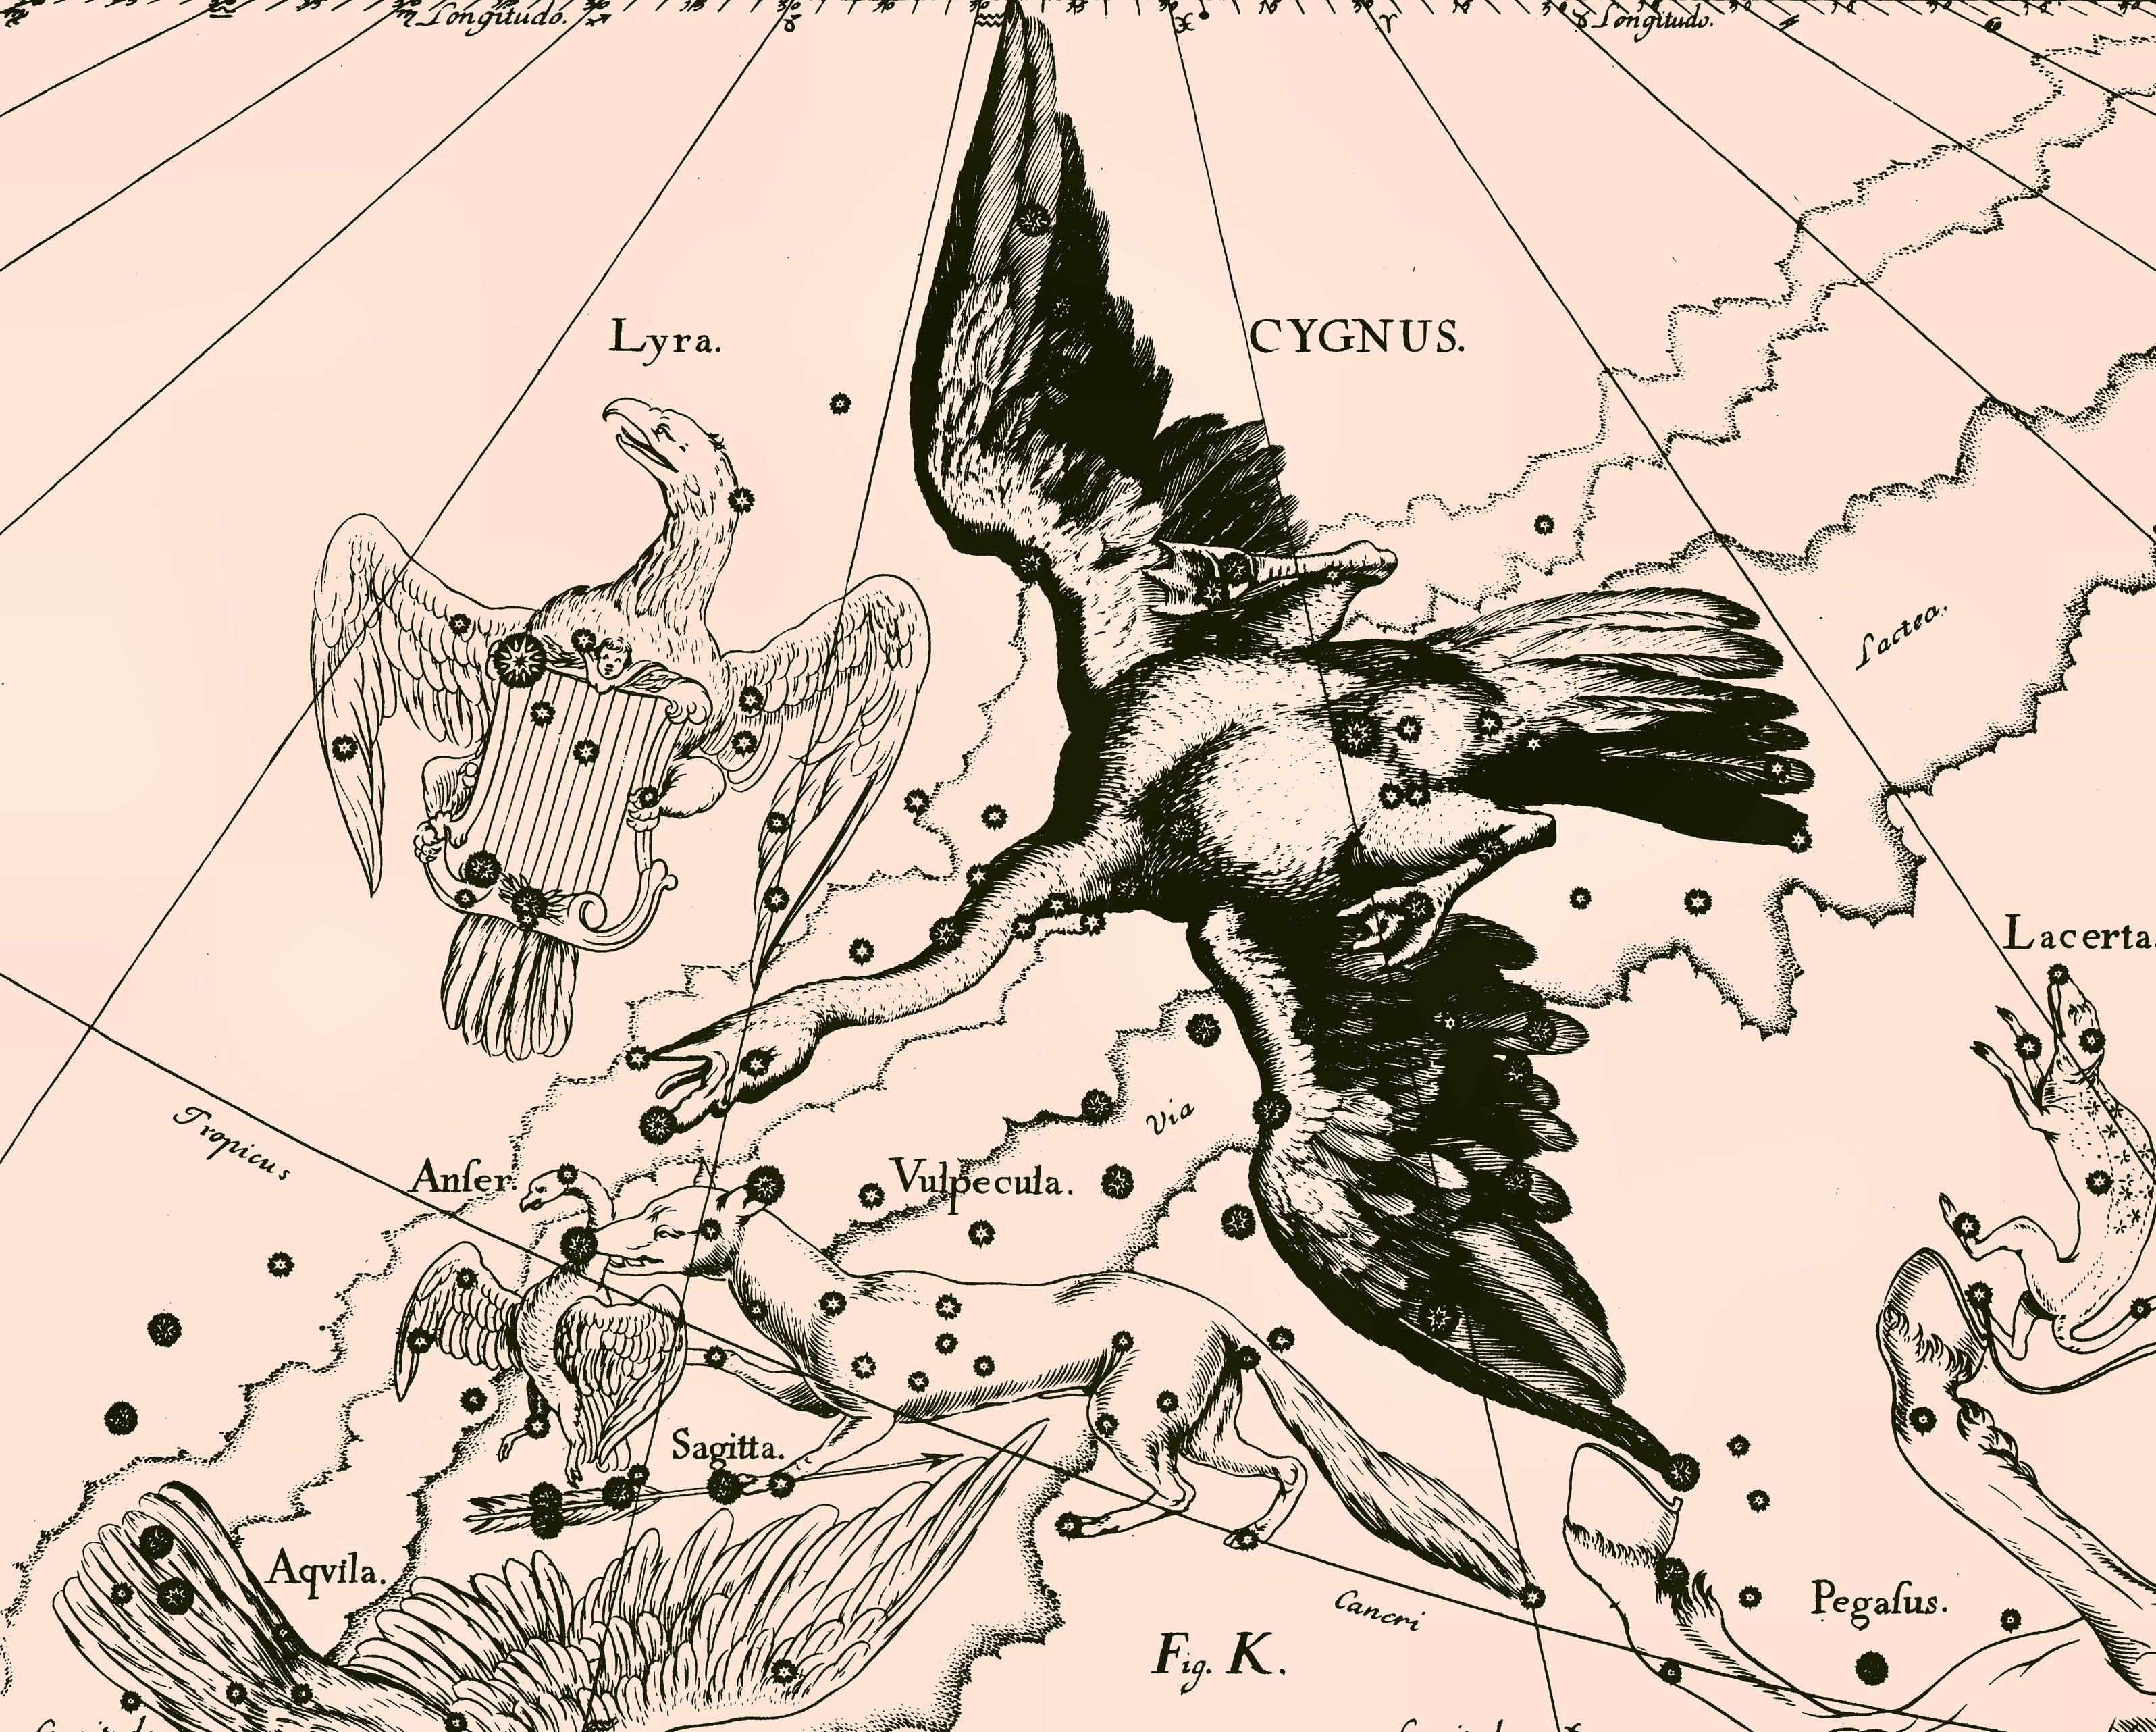 http://www.galactic.name/constellations/img/cygnus_constellation_uranographia_big.jpg